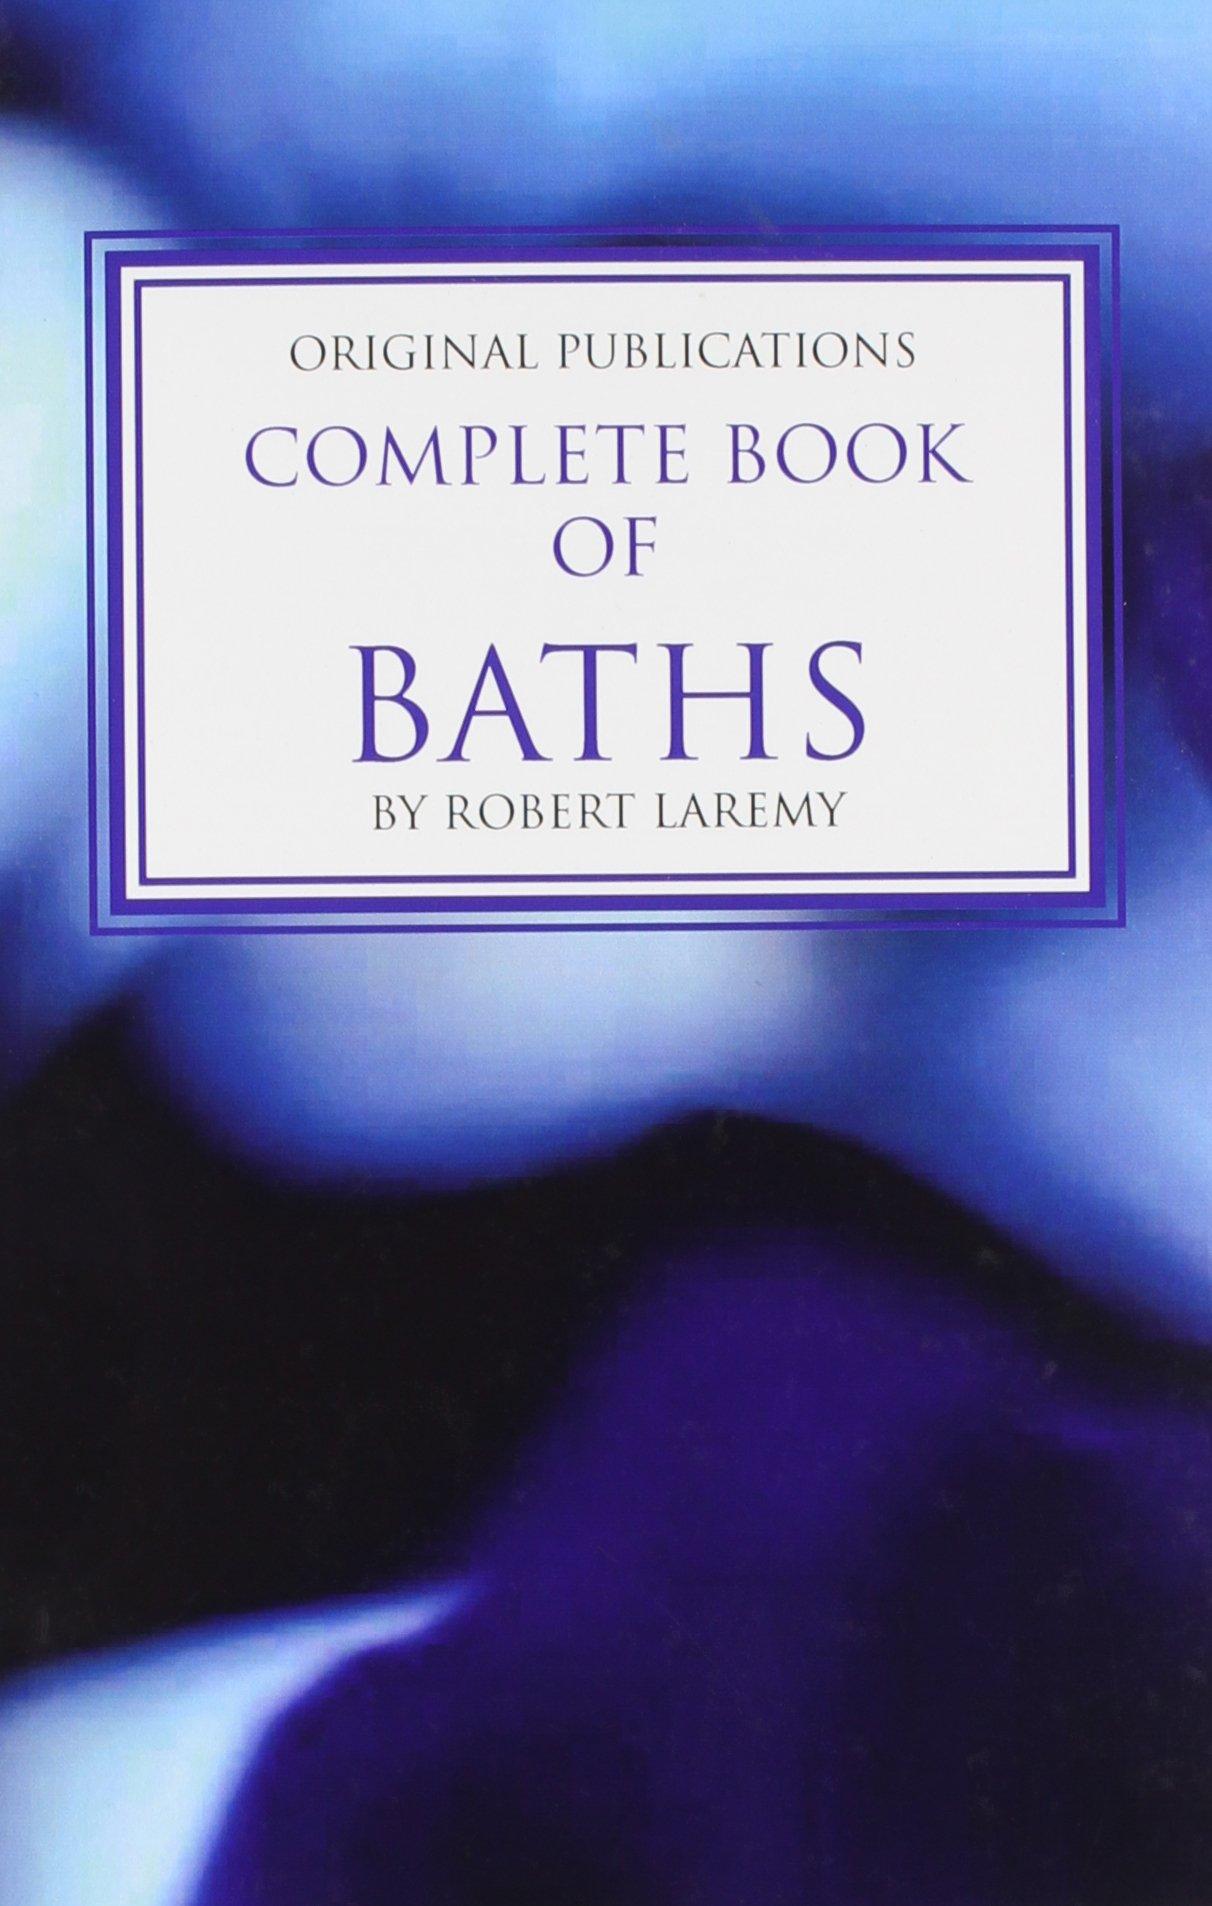 Complete Book of Baths  Original Publications Spiritual Books  amp  Supplies  9780942272734  Amazon com  Books. Complete Book of Baths  Original Publications Spiritual Books